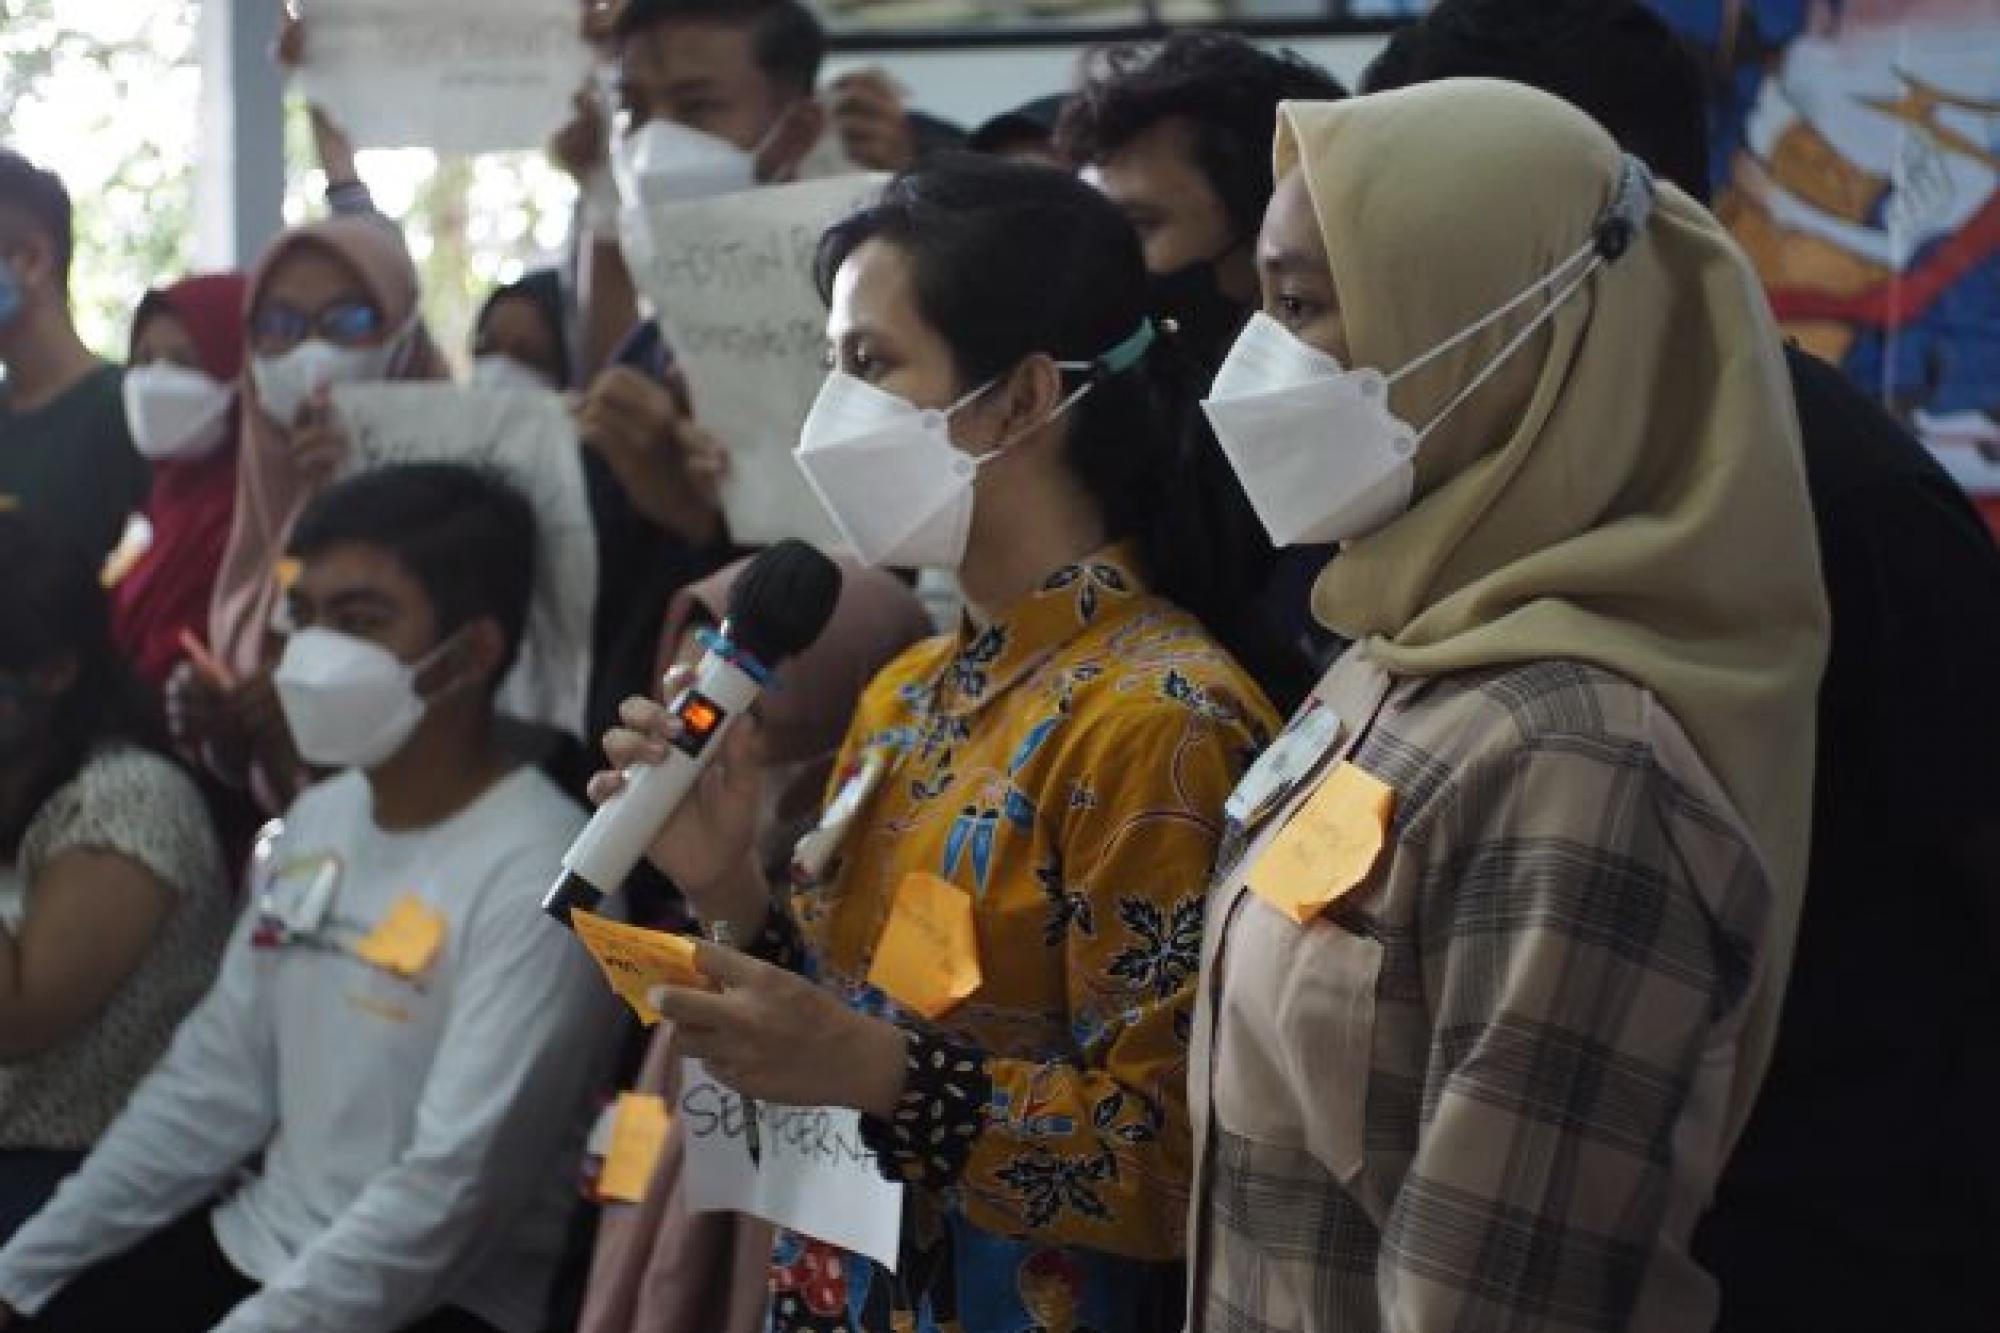 SIARAN PERS: Aksi Nyata Pembaharu Muda Mendorong Regulasi Pengendalian Tembakau yang Kuat untuk Melindungi Anak